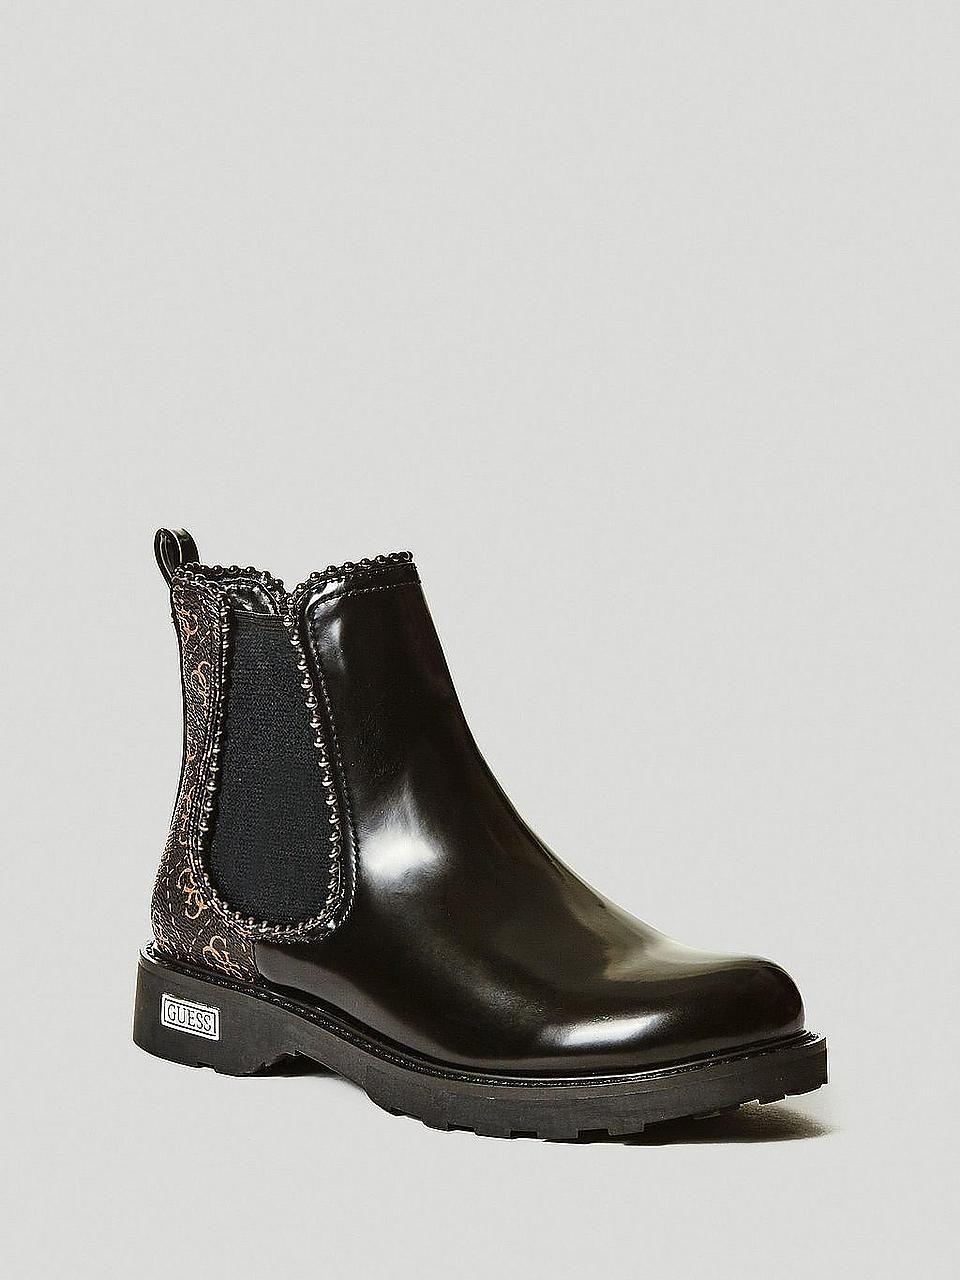 the latest 82928 c023a Guess Stiefel | Boots & Stiefeletten | BAUR | Winterschuhe ...